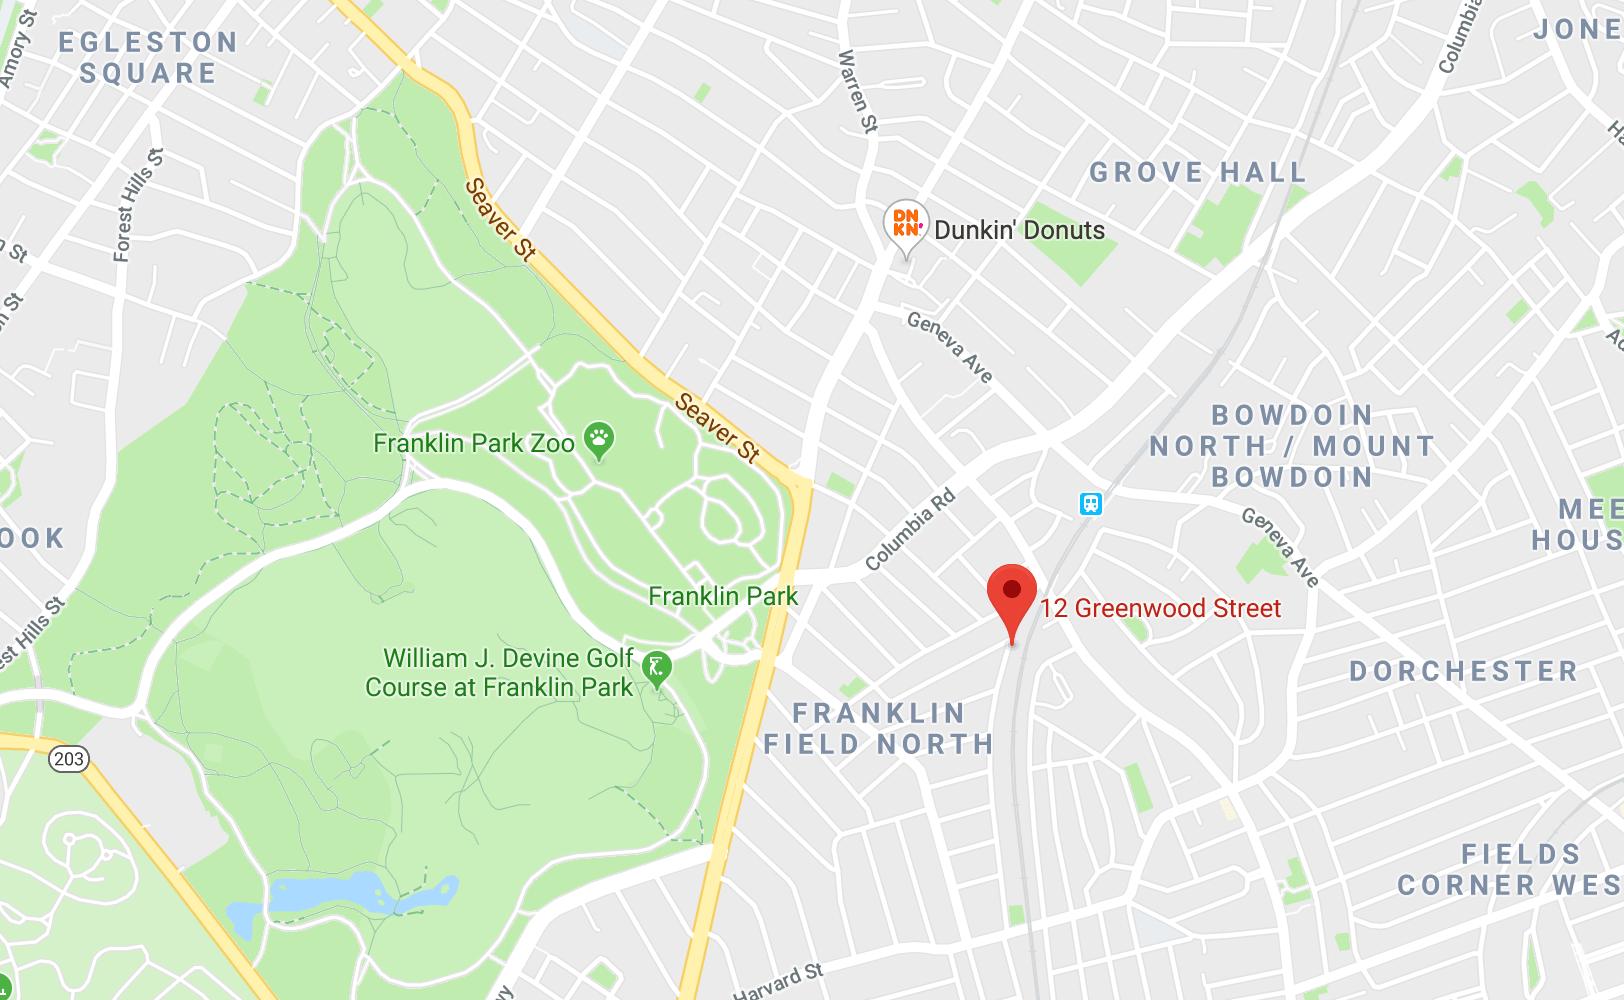 Man Killed In Dorchester Shooting | WBUR News